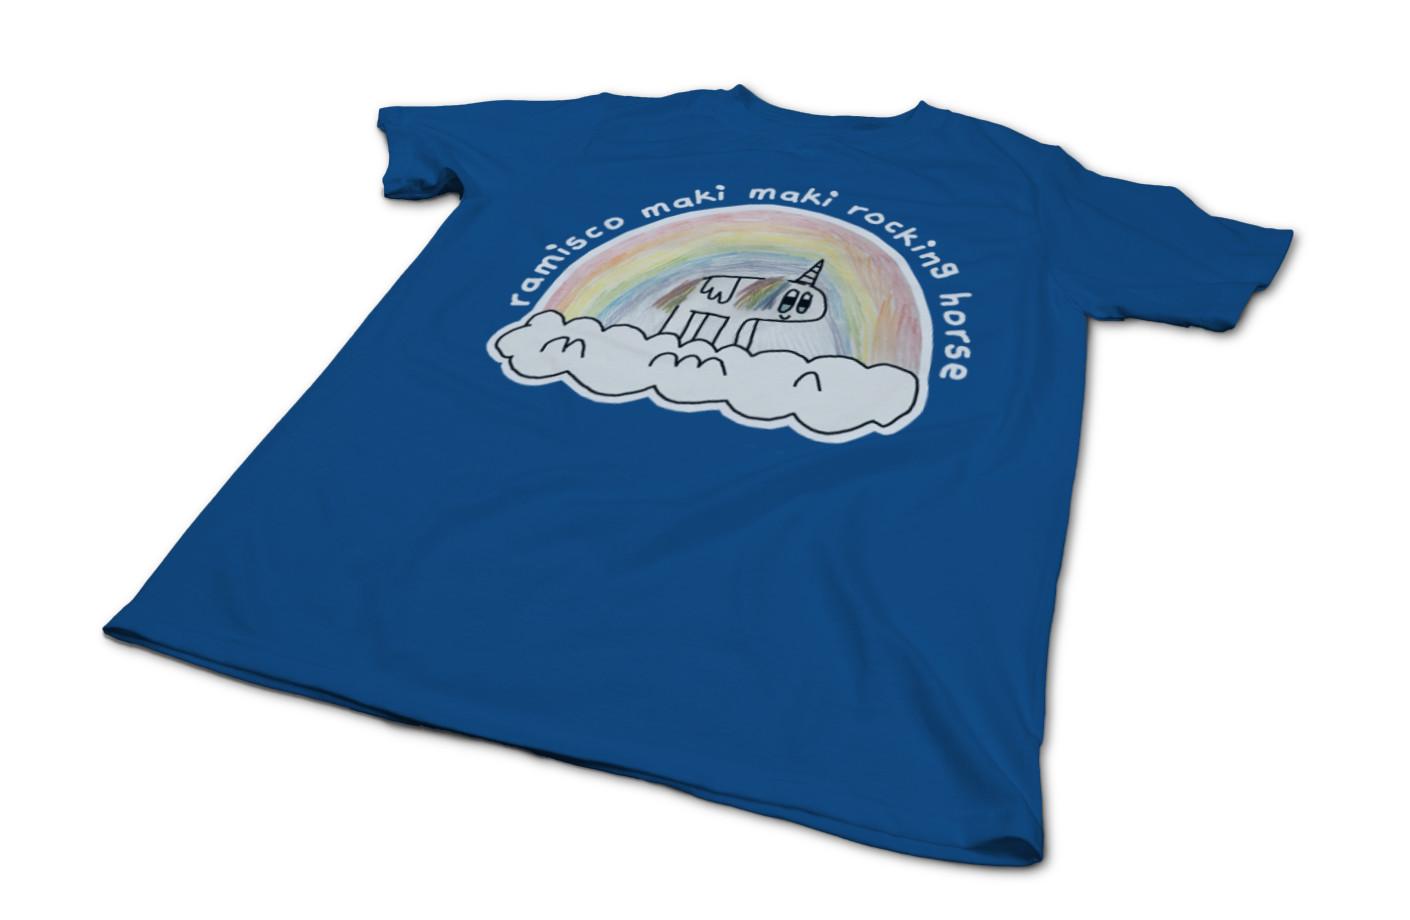 The ramisco maki maki rocking horse rainbow horse   t shirt  by noah austin mccartney  1552136060